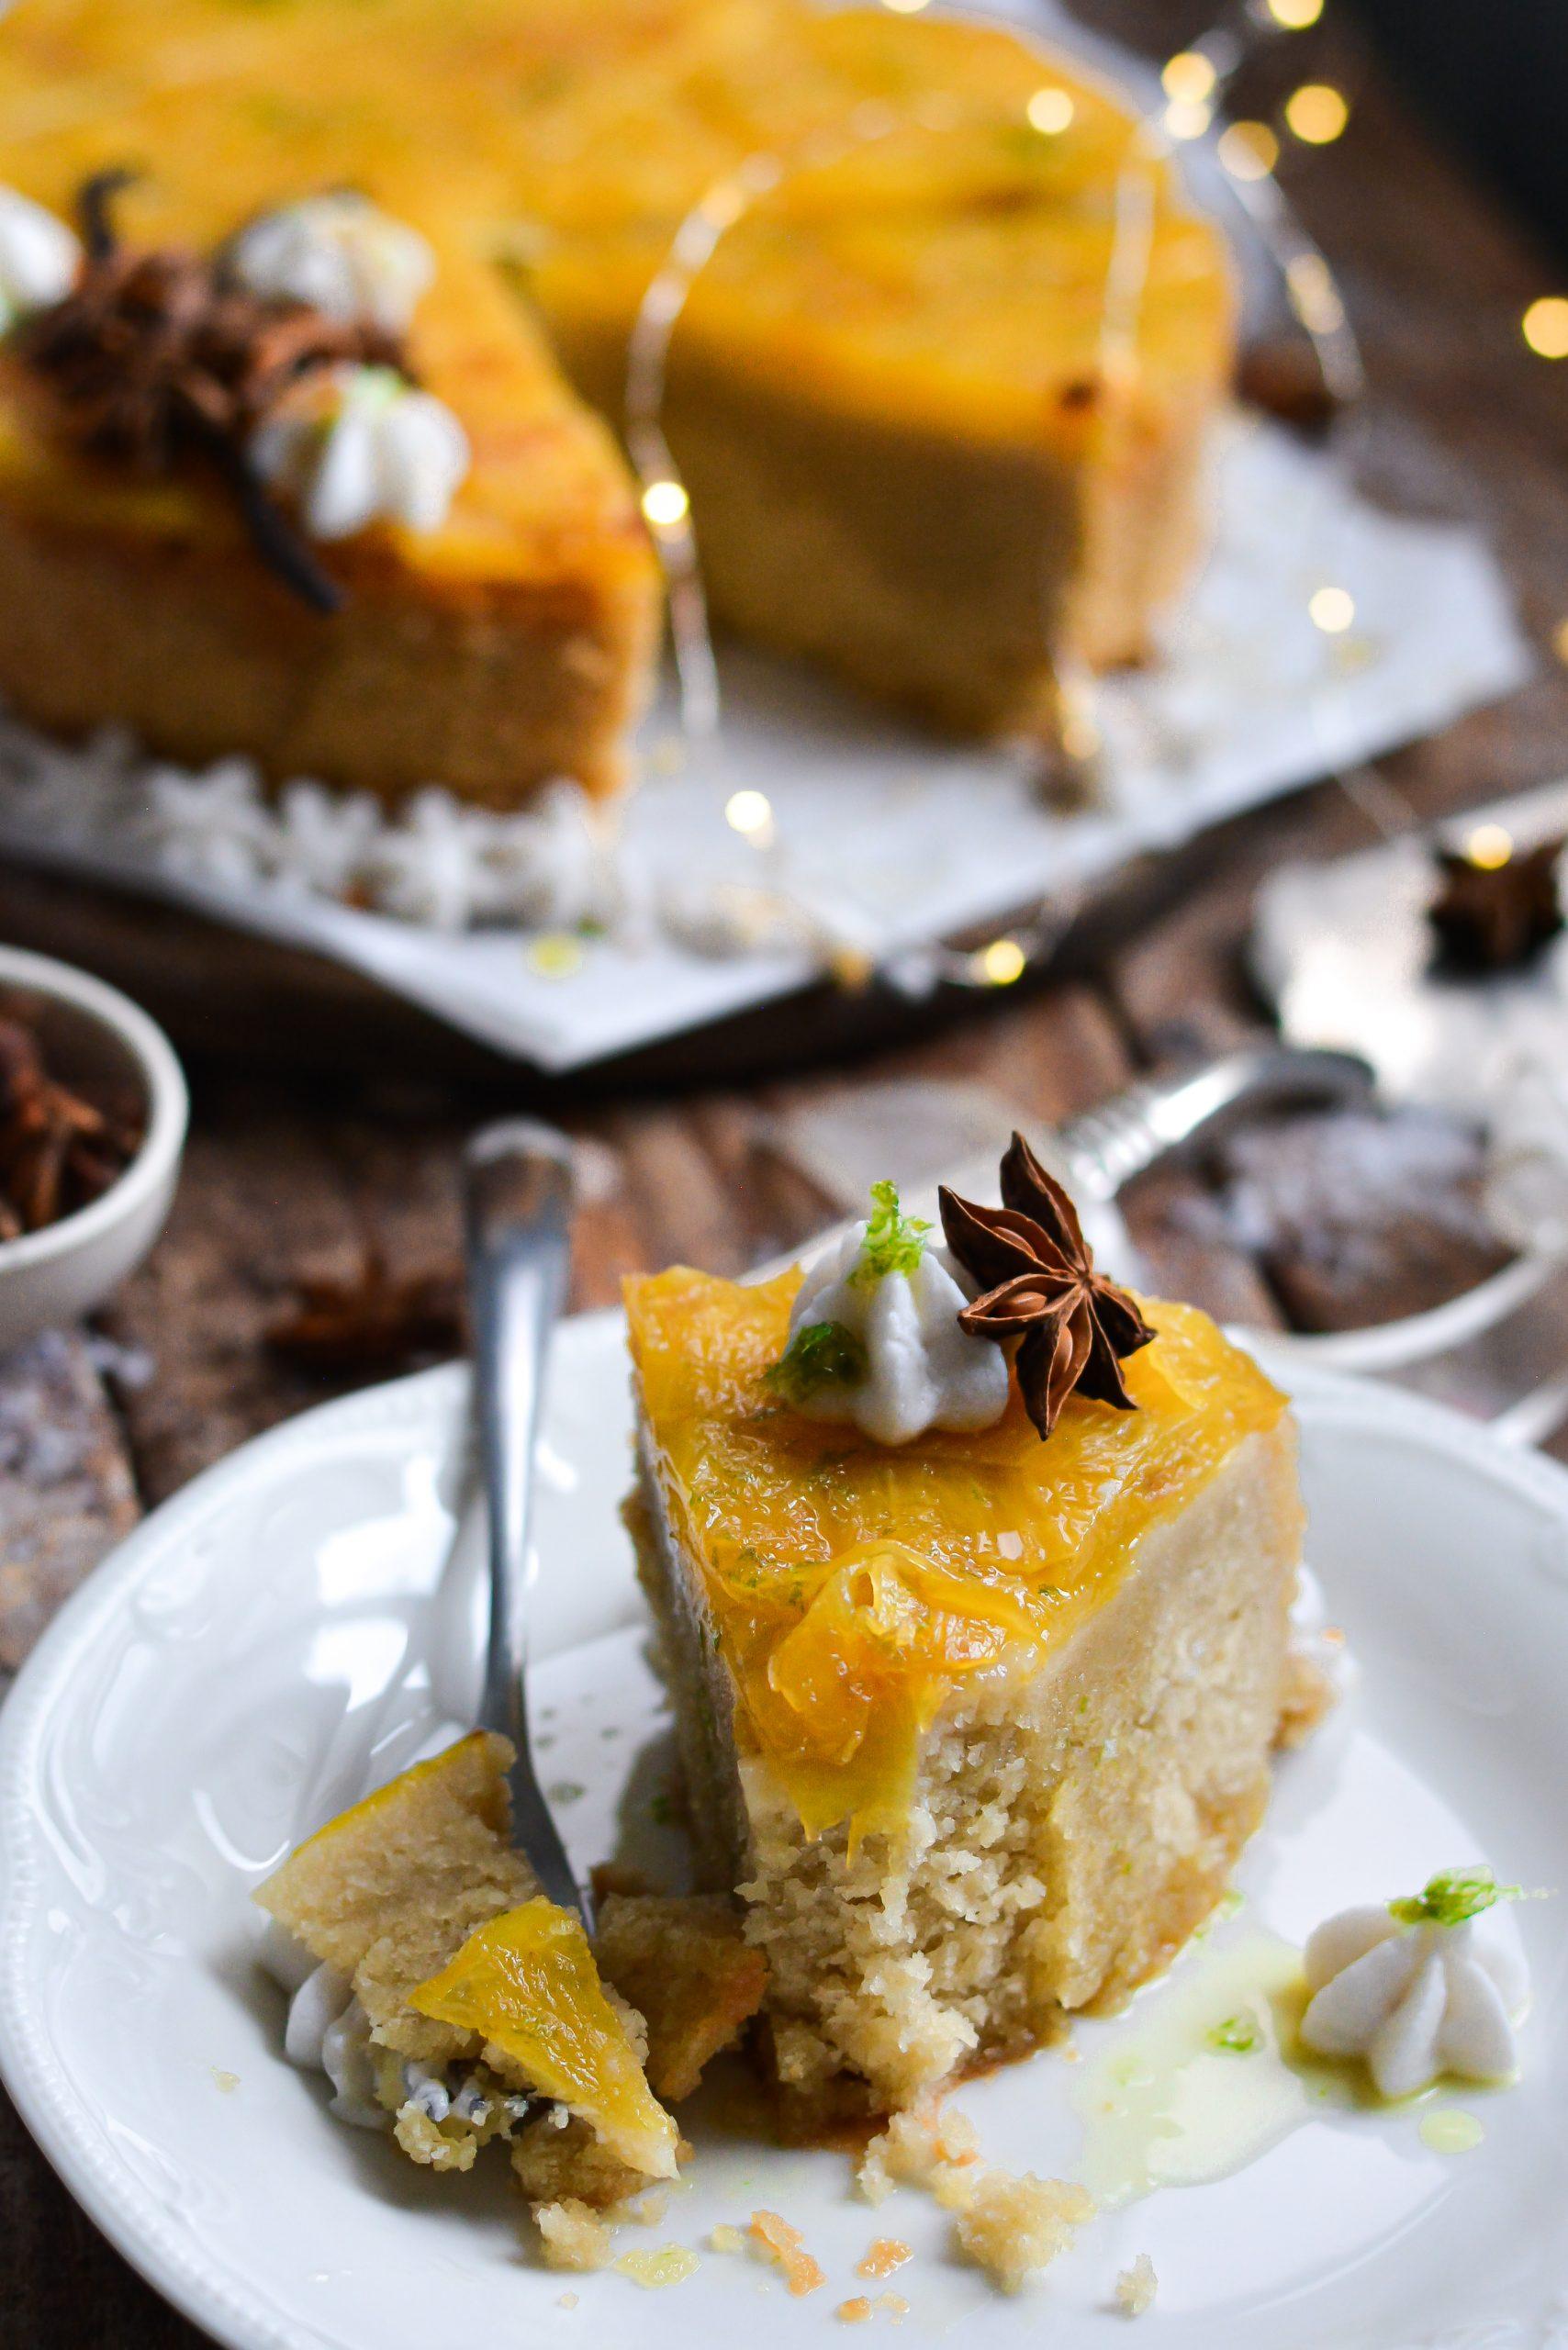 Gâteau Renversé Vegan Ananas et Citron Vert / Vegan Pineapple and Lime Upside Down Cake